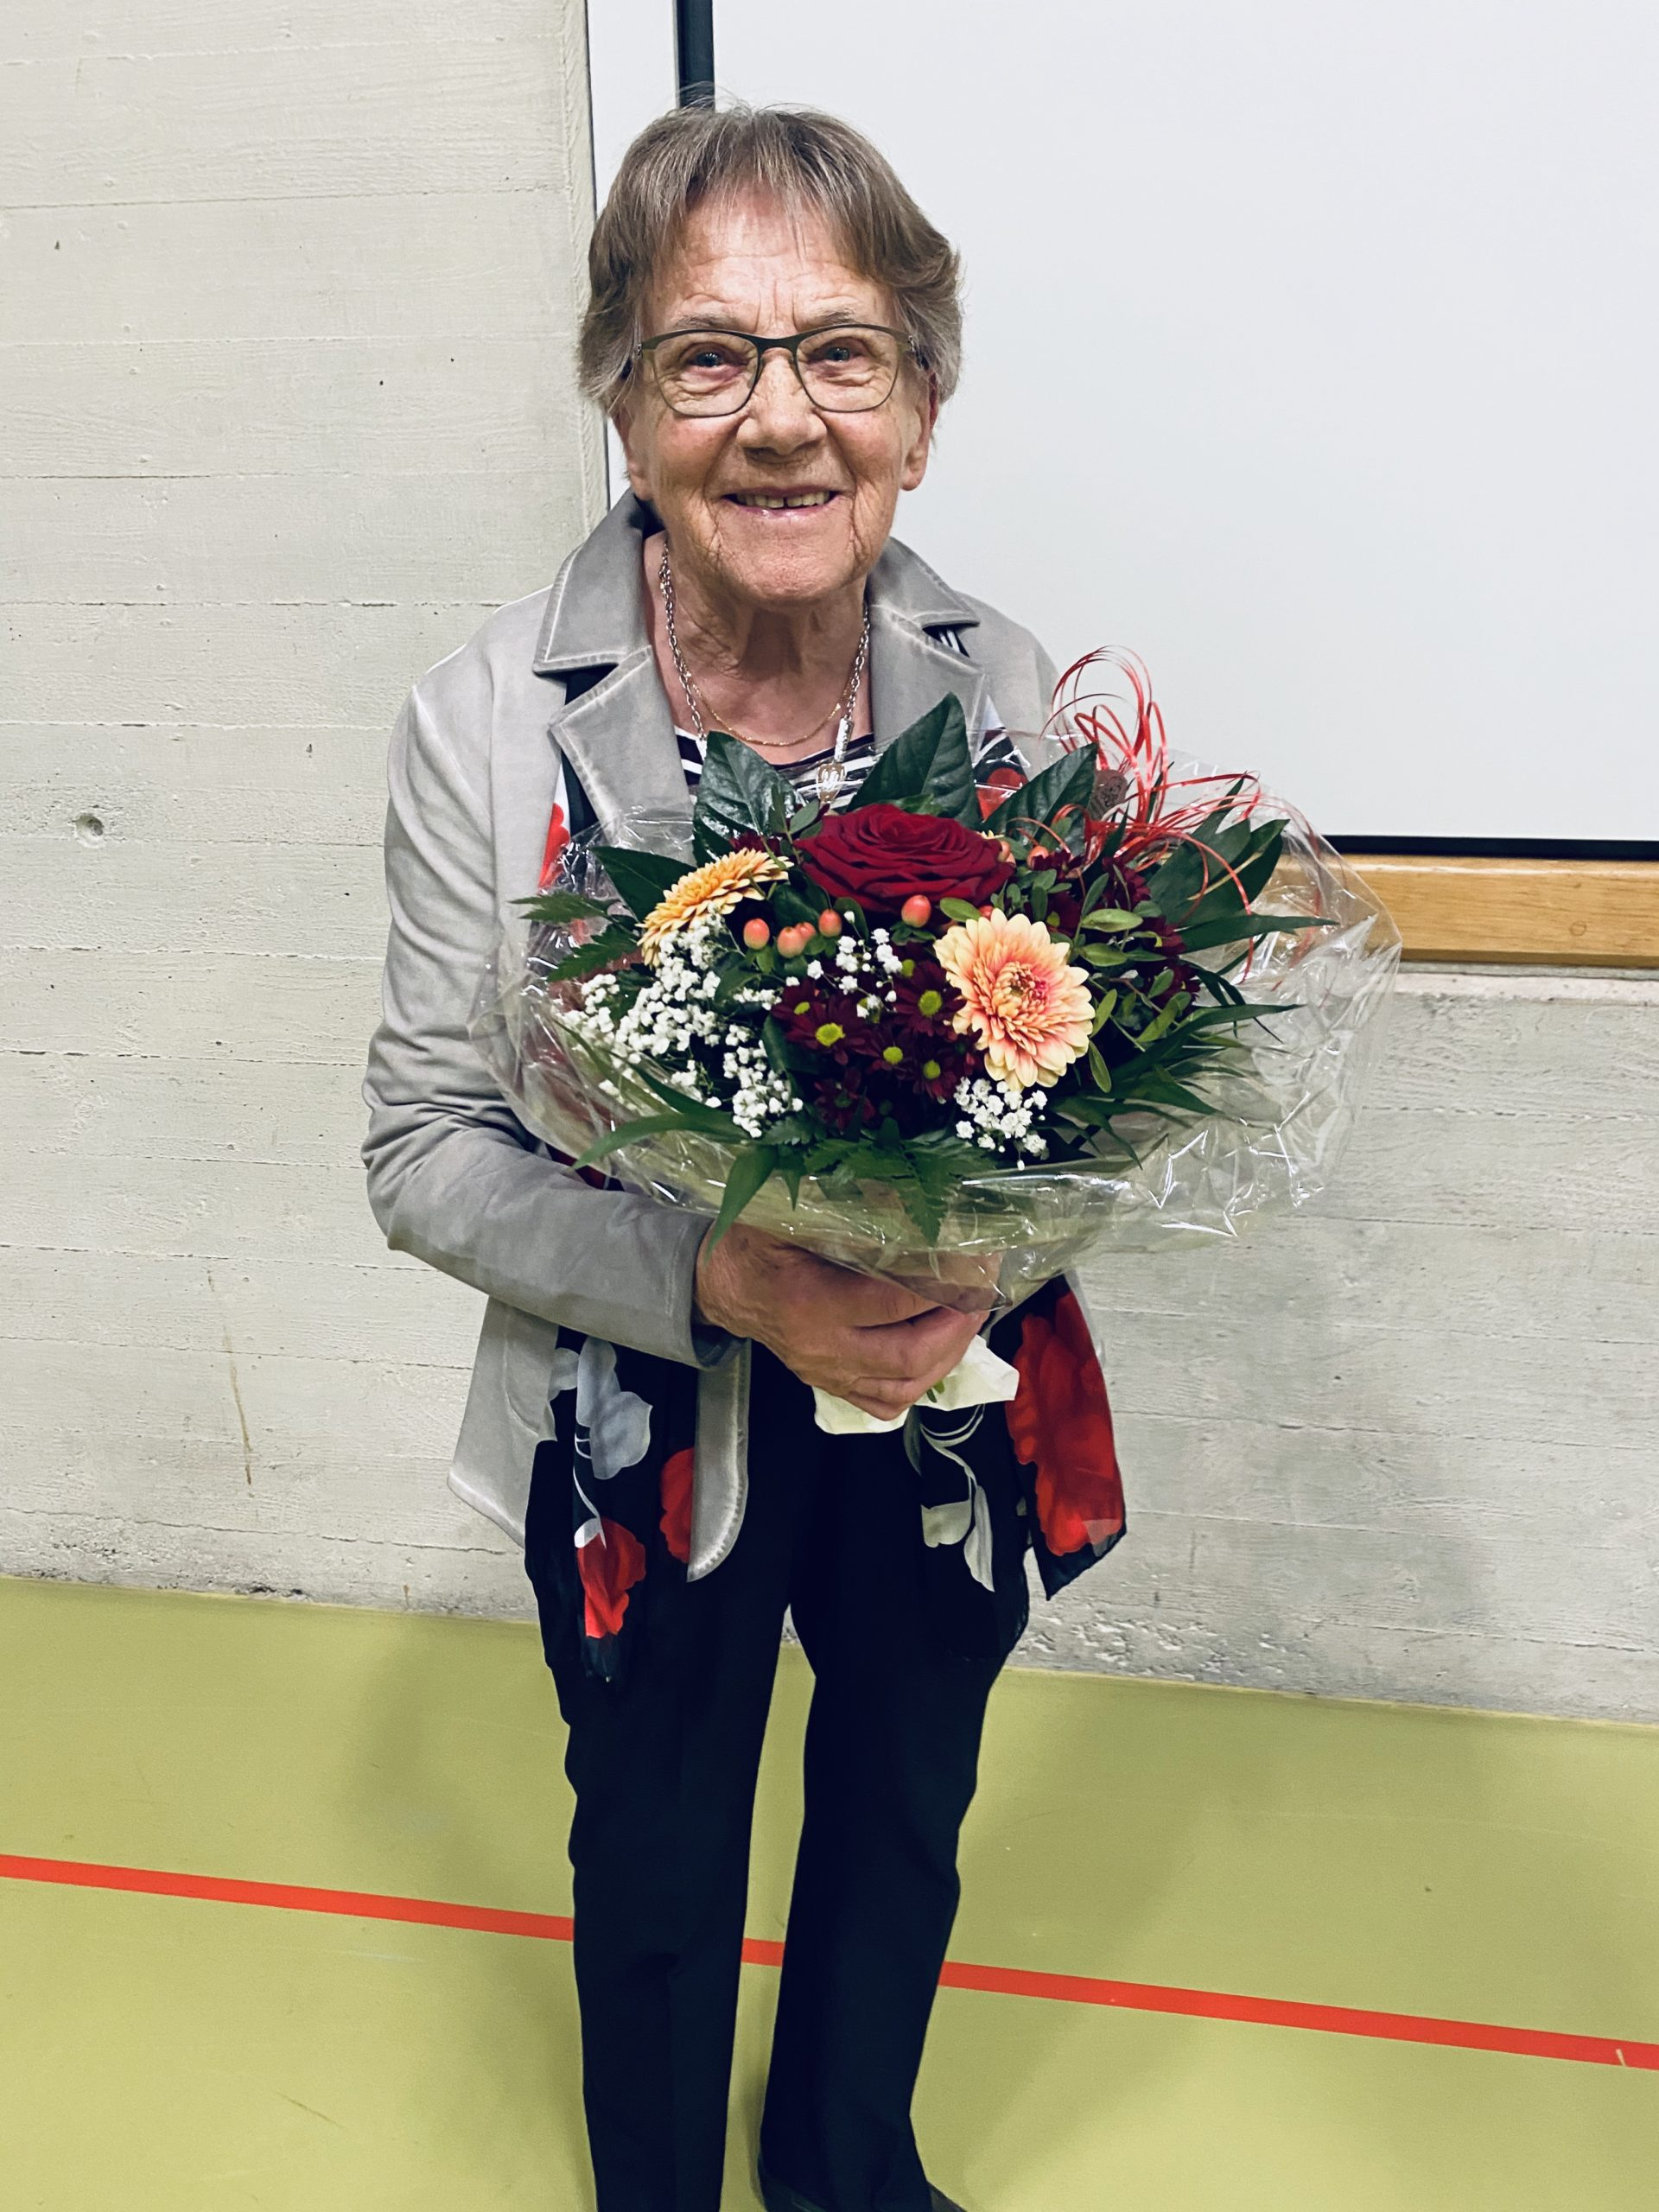 Cécile Körner-Wetzel